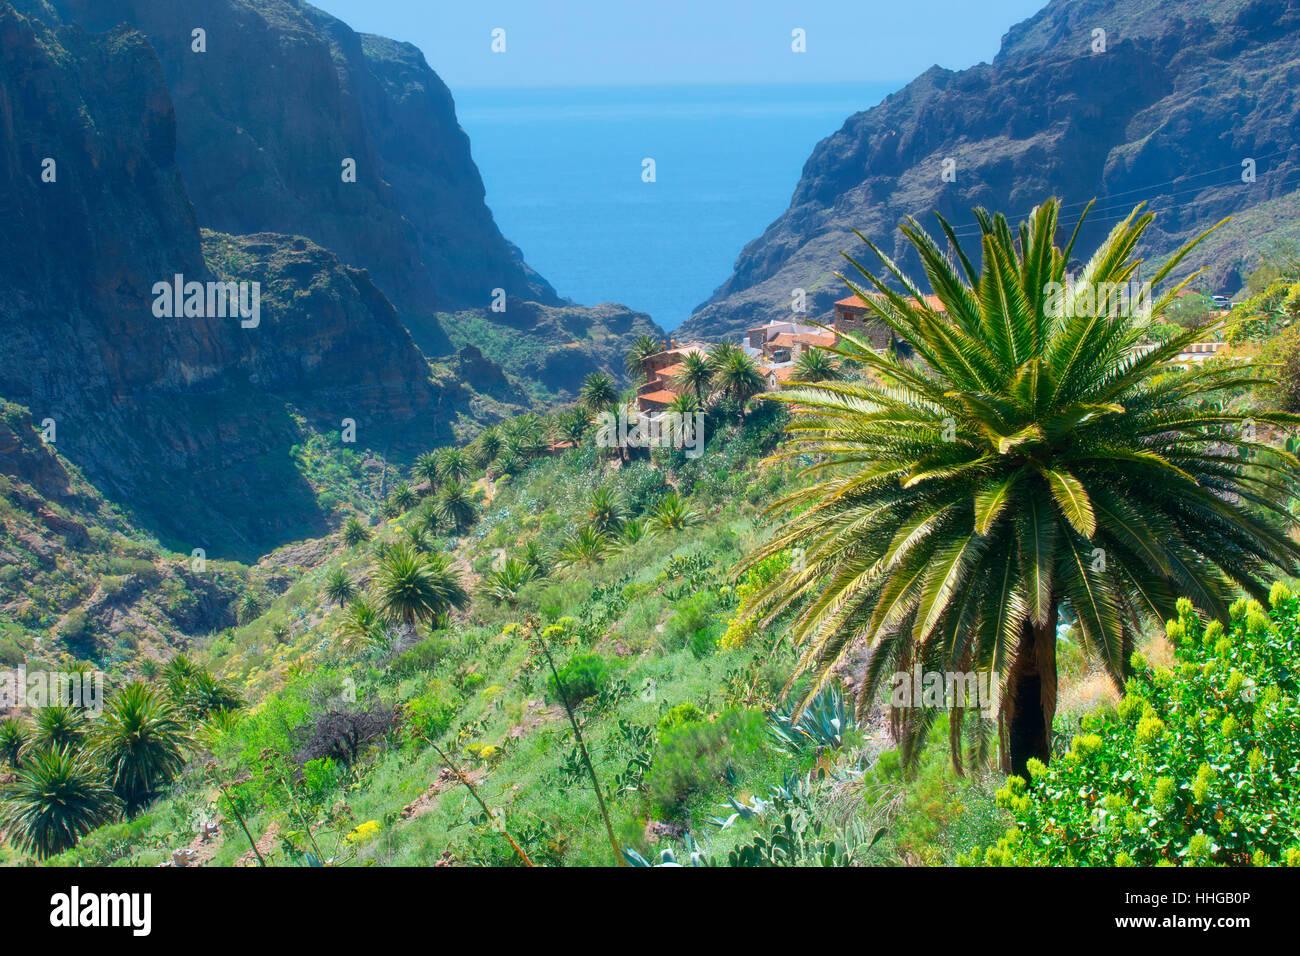 La aldea de Masca, Tenerife Imagen De Stock